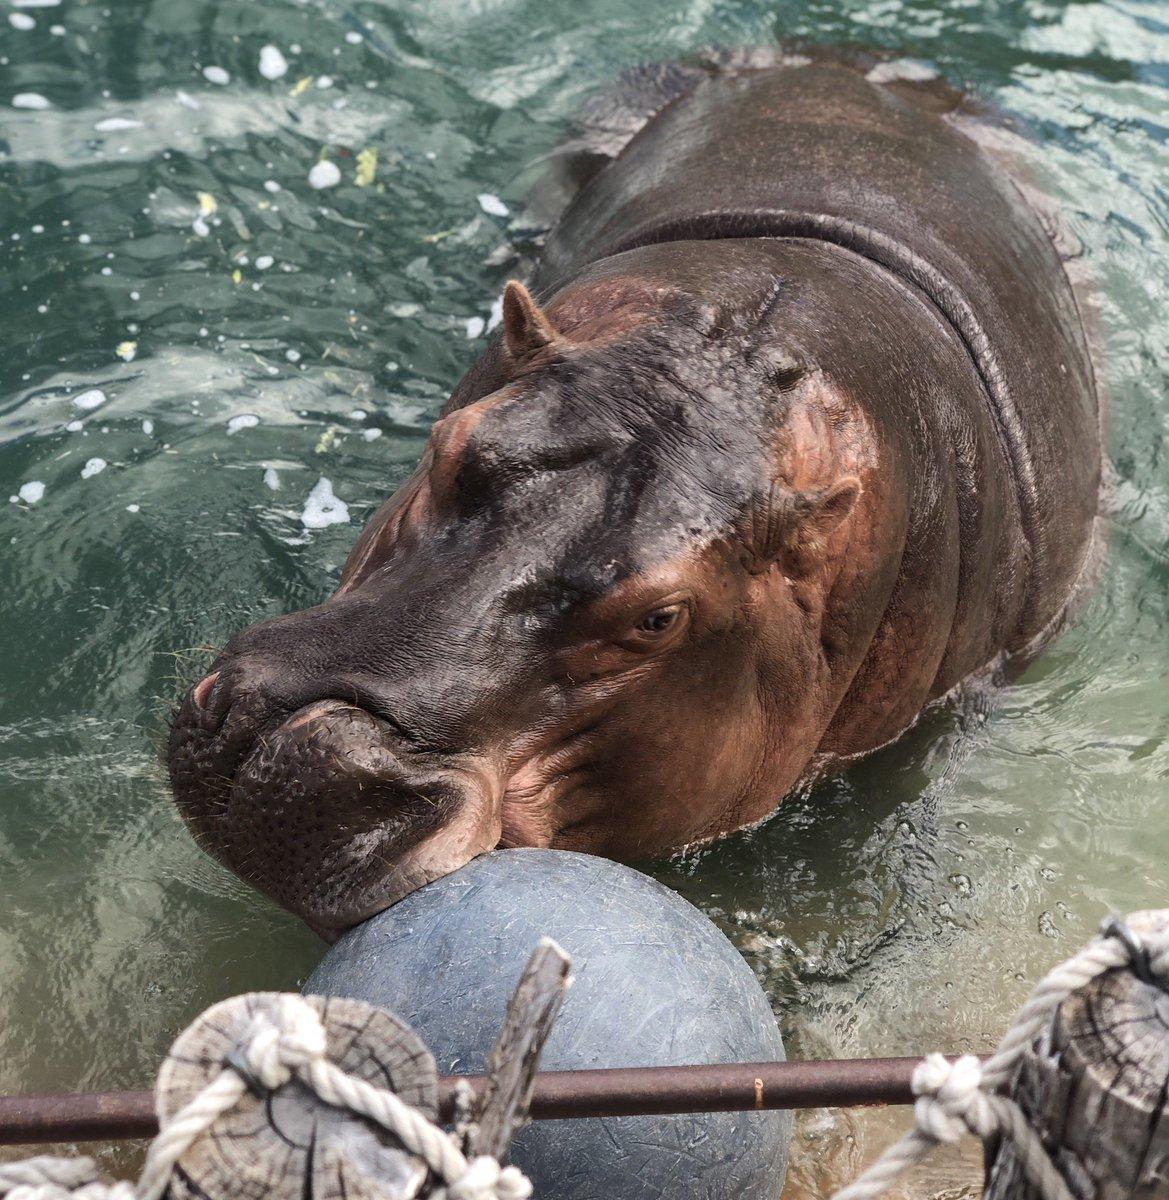 Happy international #hippo day from Karen! #ABQBioPark #Zoo